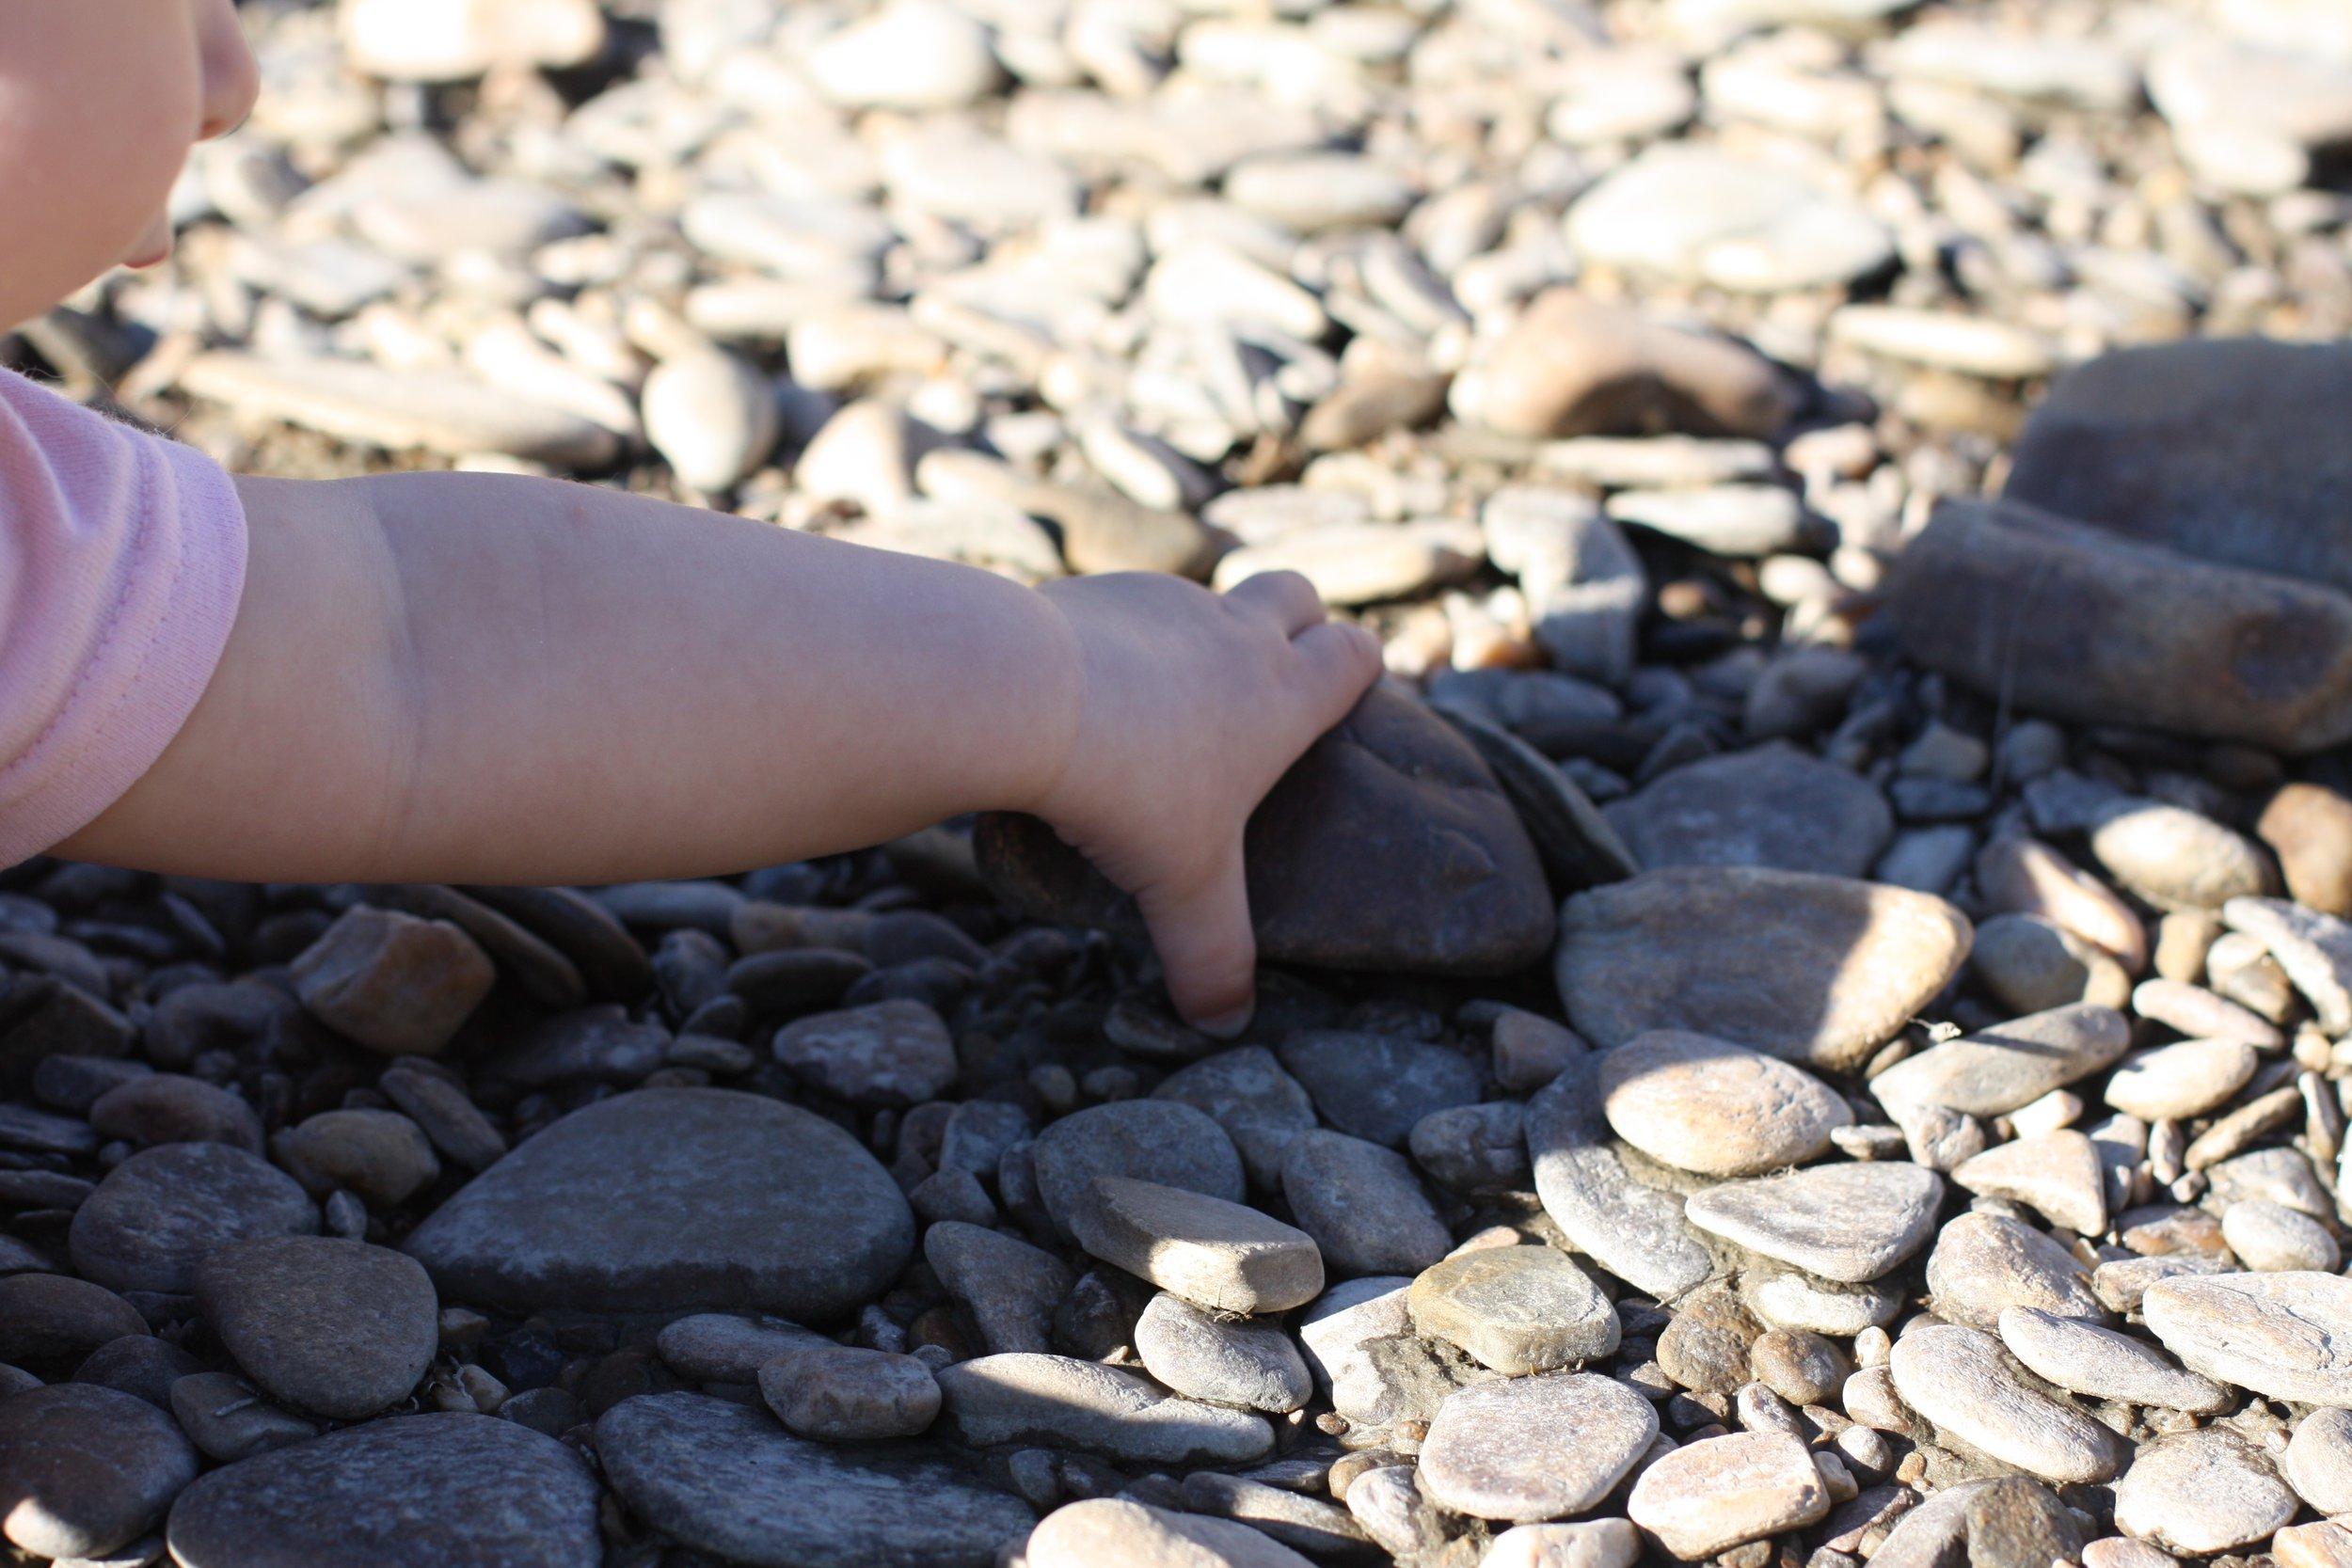 Riverwalking | 14 Mile Farm Handweaving and Homesteading in Alaska